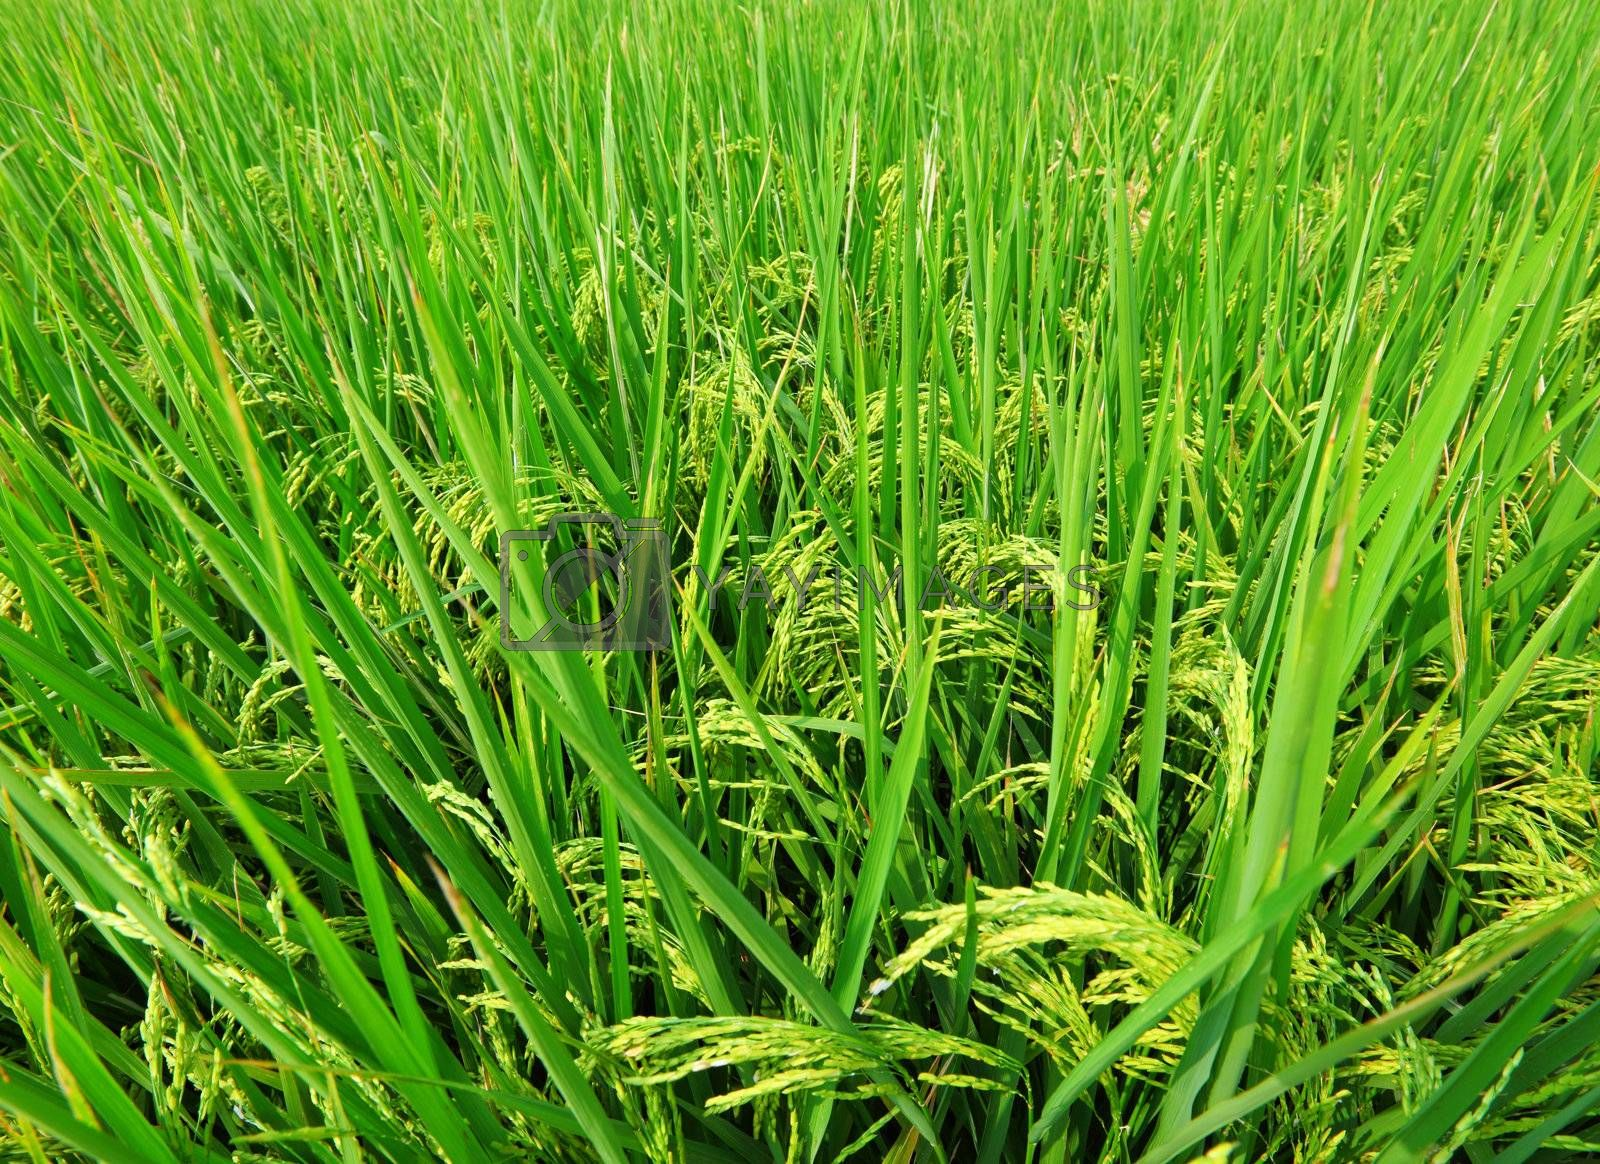 Asia paddy field